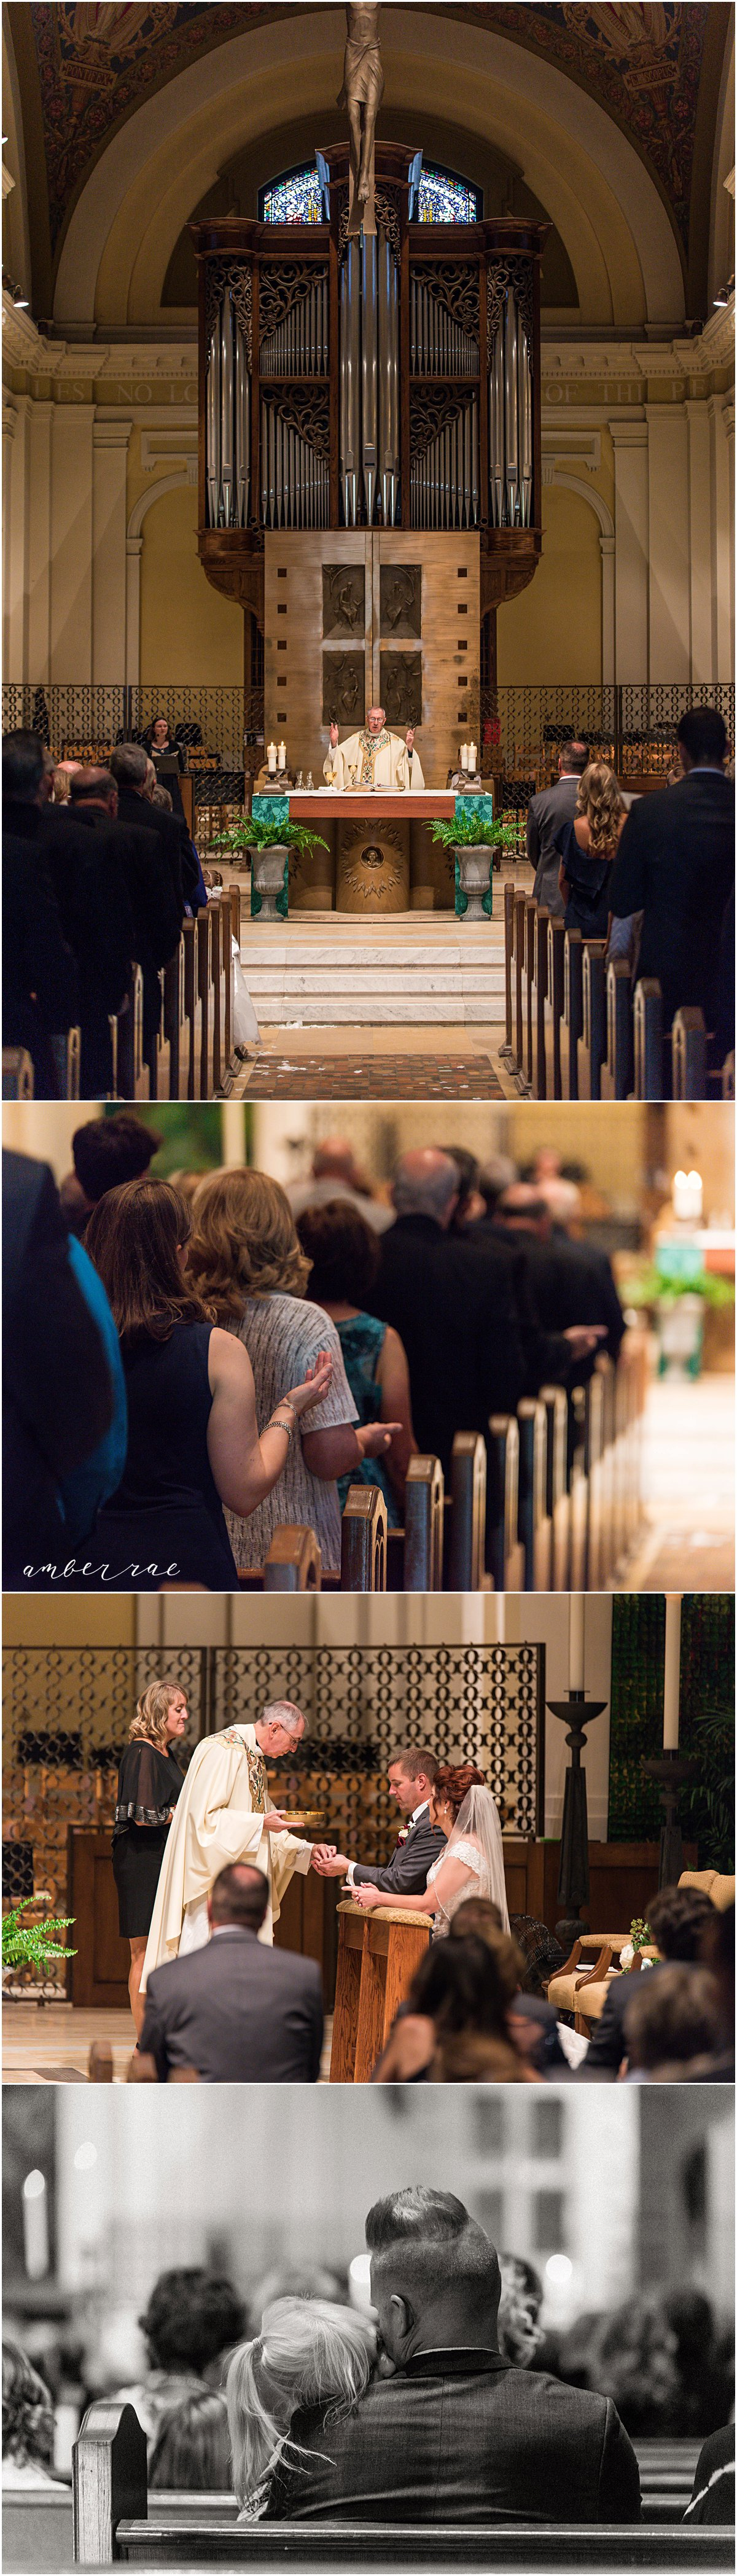 Gustafson Wedding 2018_0018.jpg